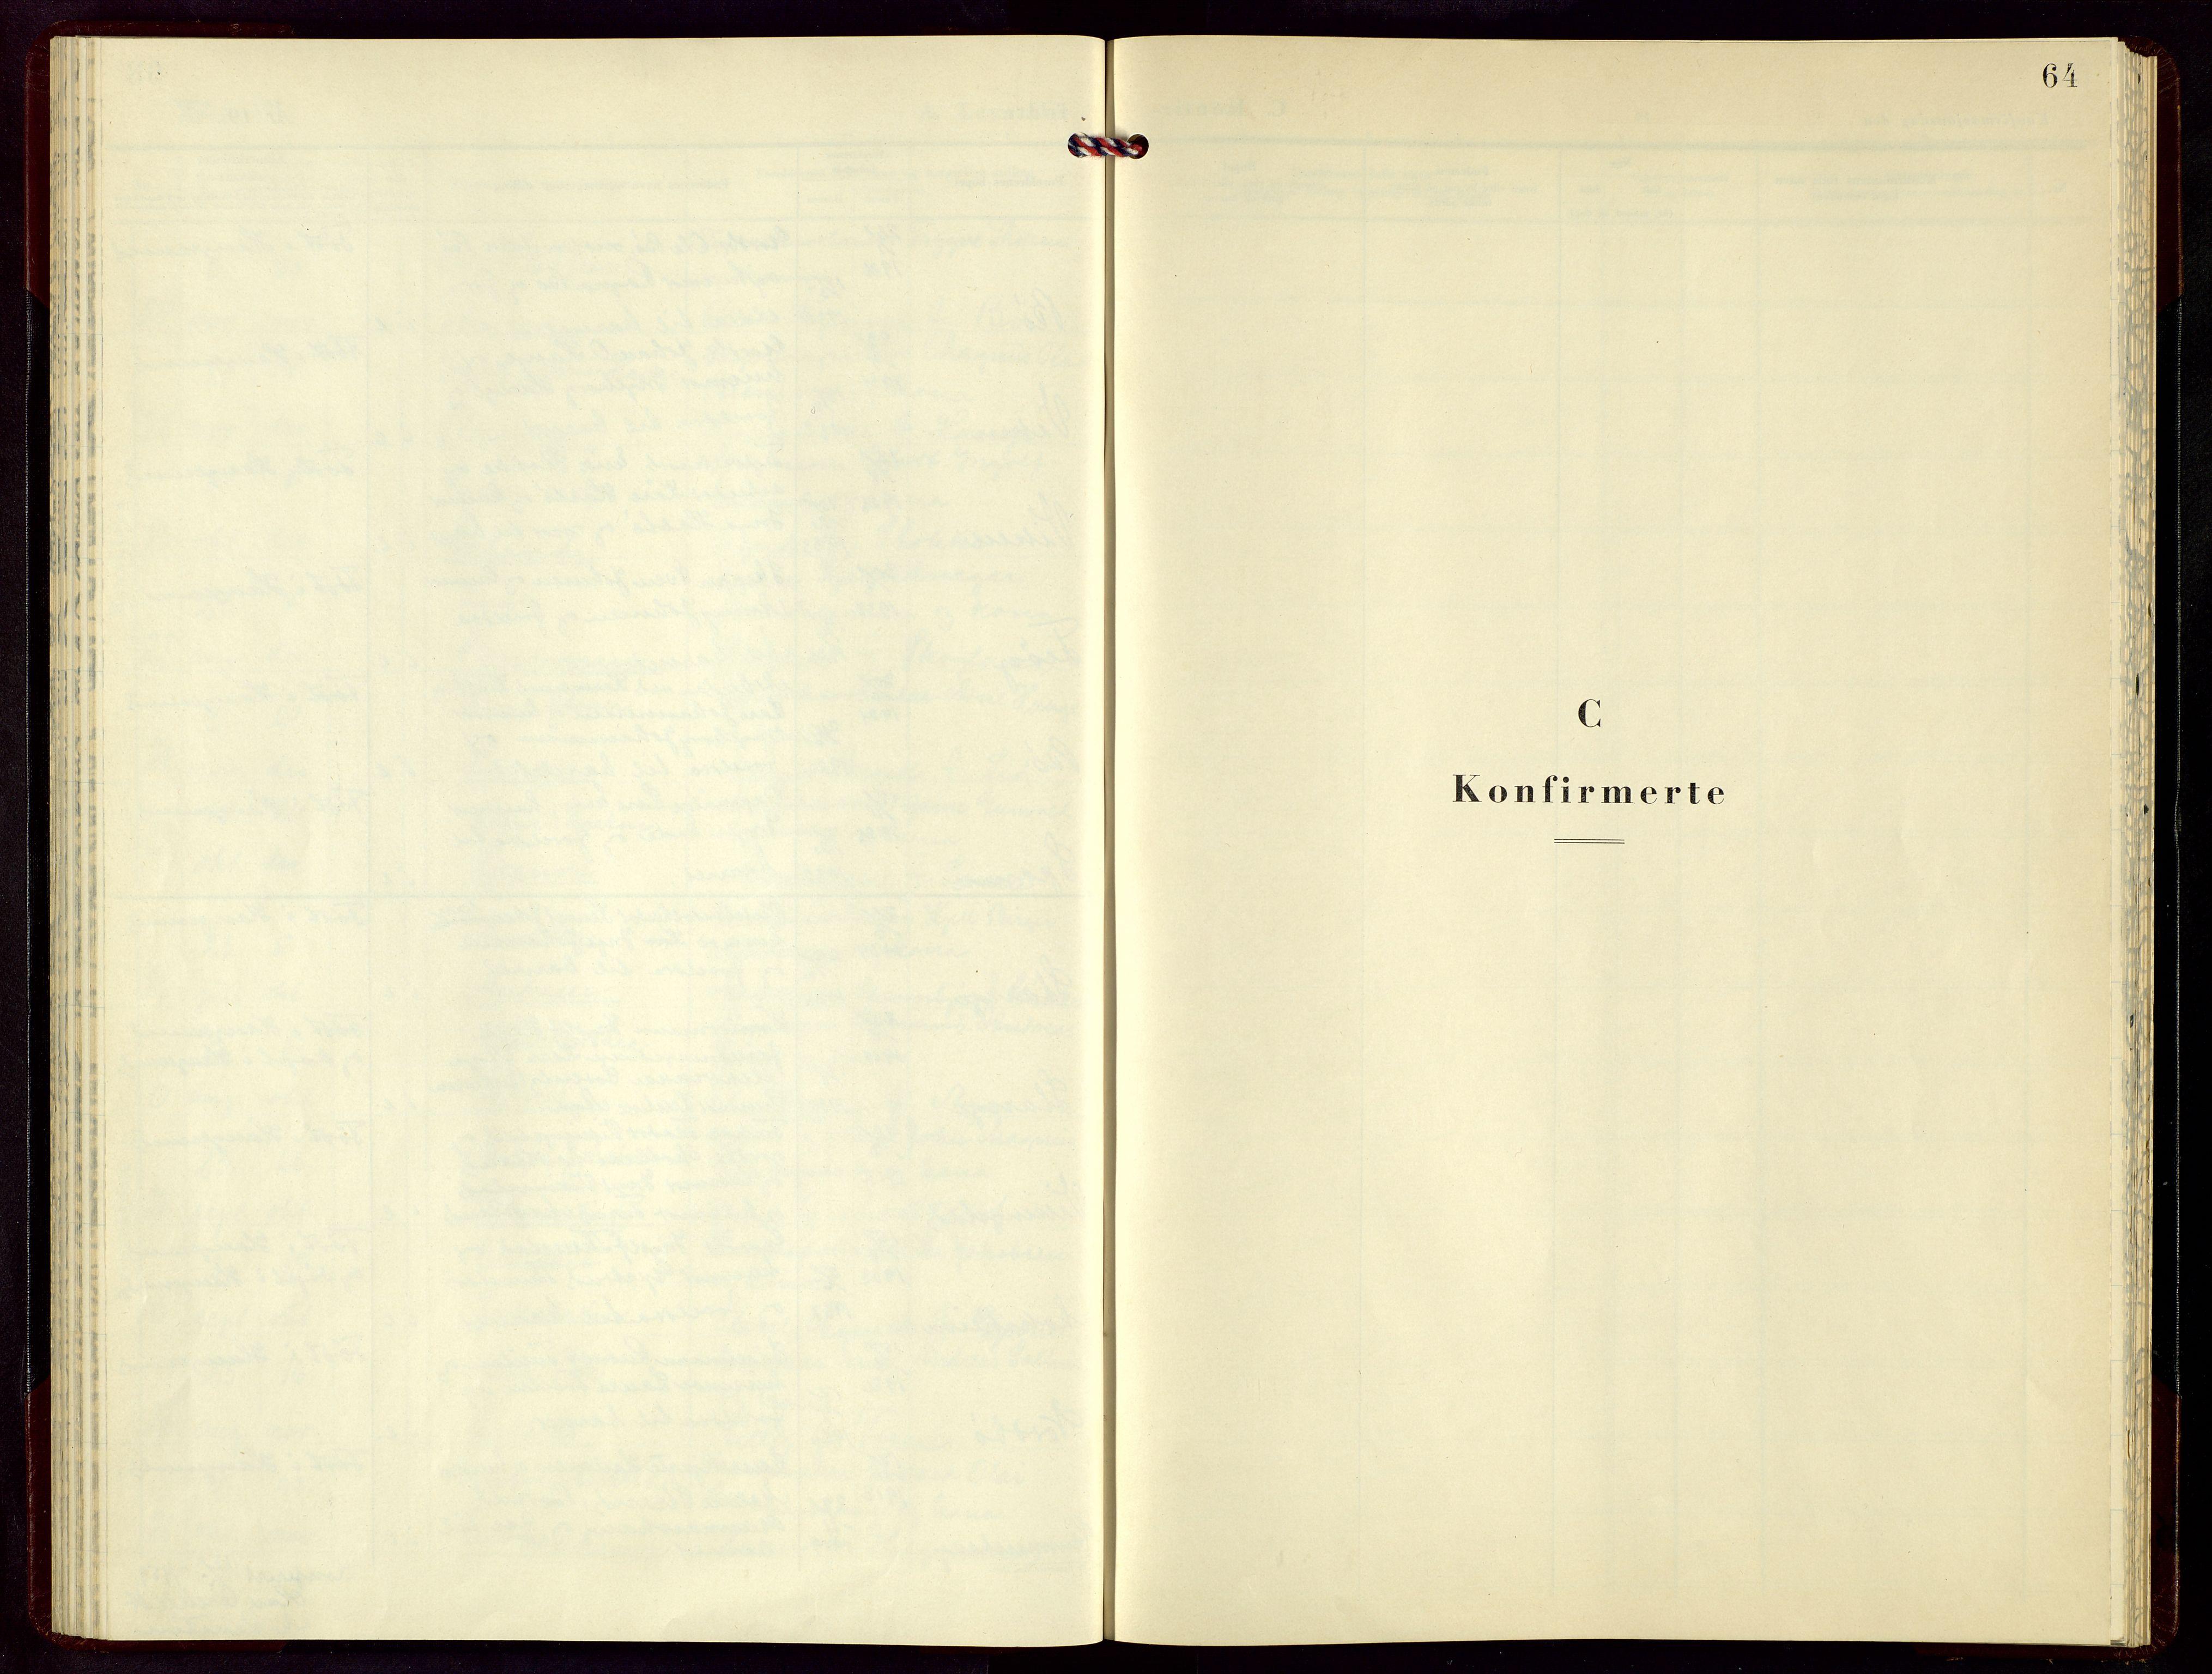 SAST, Torvastad sokneprestkontor, H/Ha/Hab/L0010: Klokkerbok nr. B 10, 1947-1959, s. 64